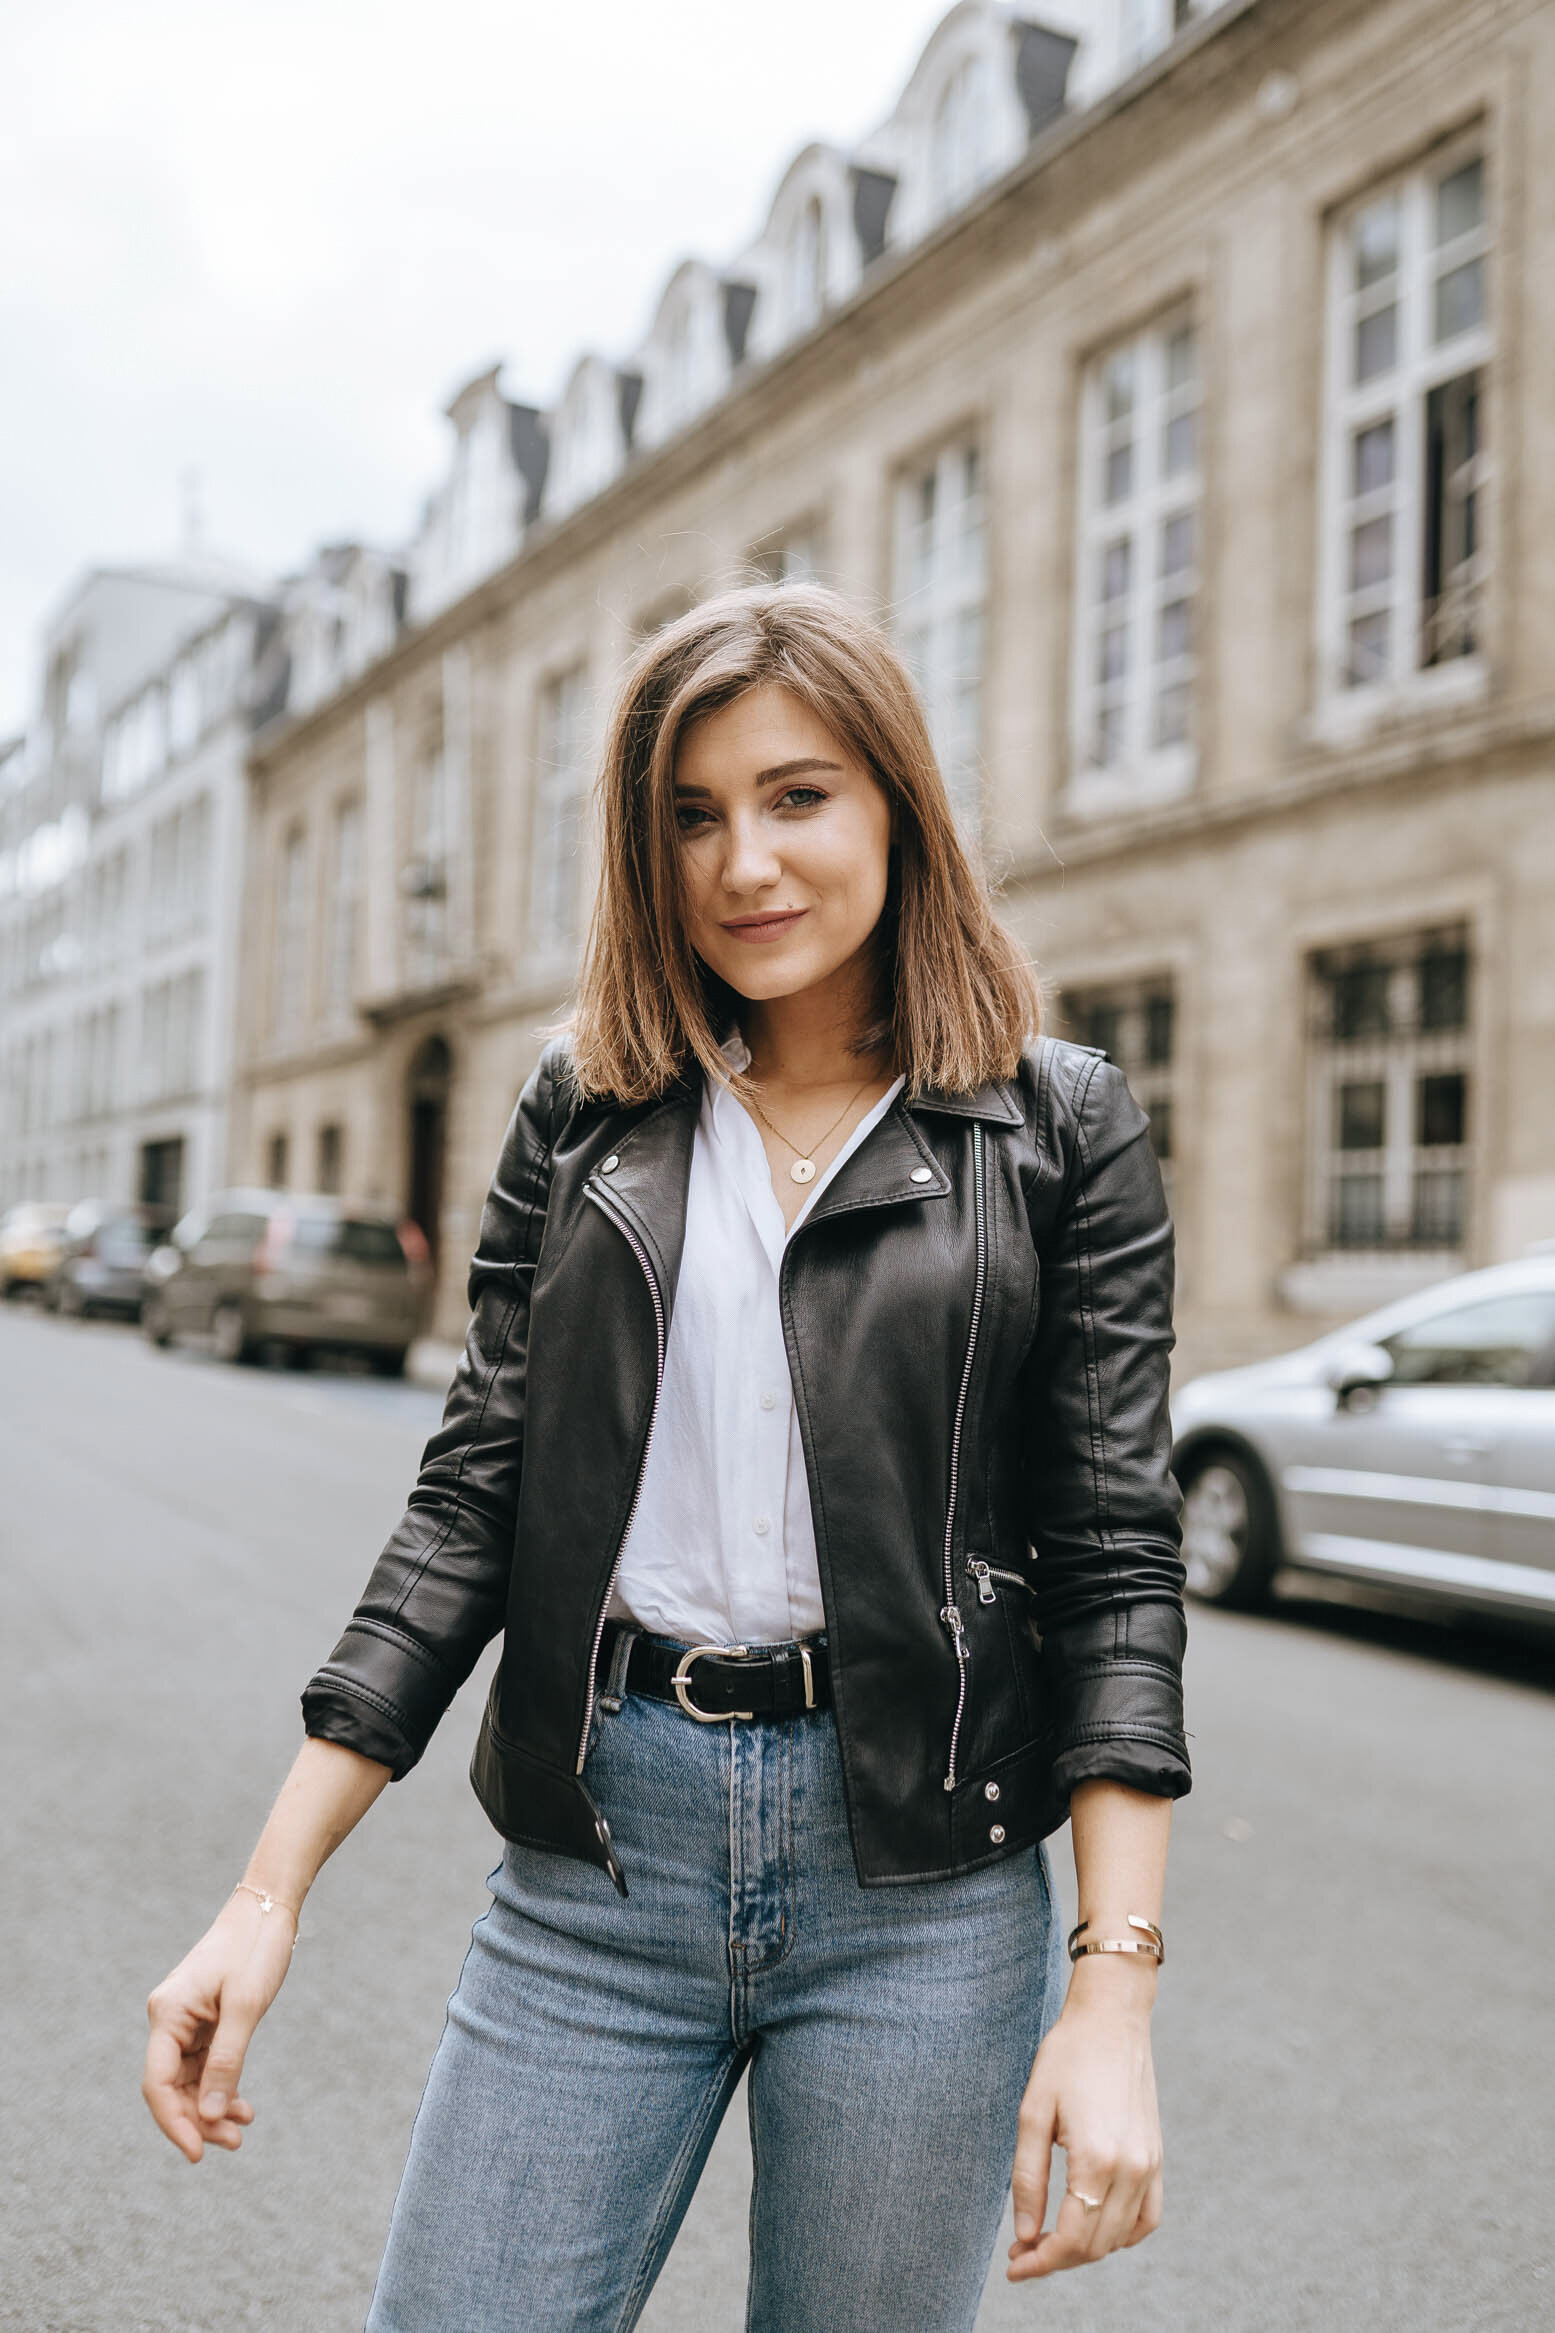 photographe-bruxelles-portrait-femme-nicolasleleu-19.jpg